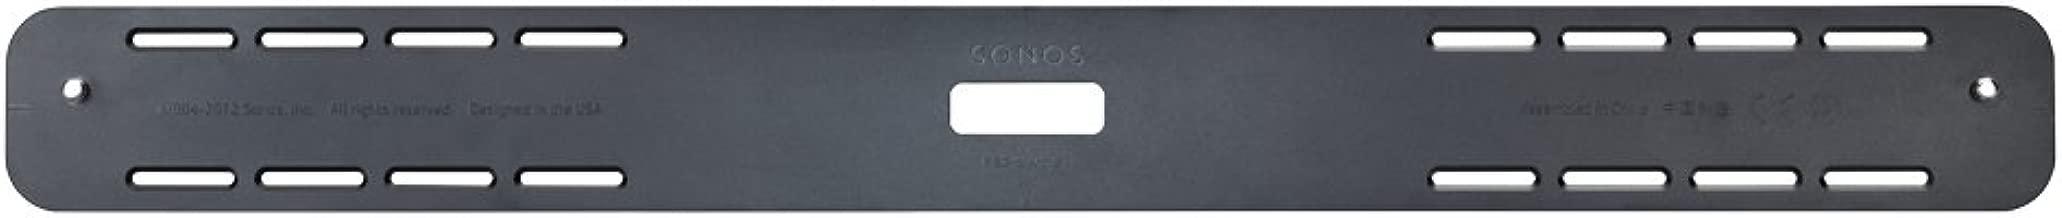 Sonos PLAYBAR Wall Mount Kit, Black